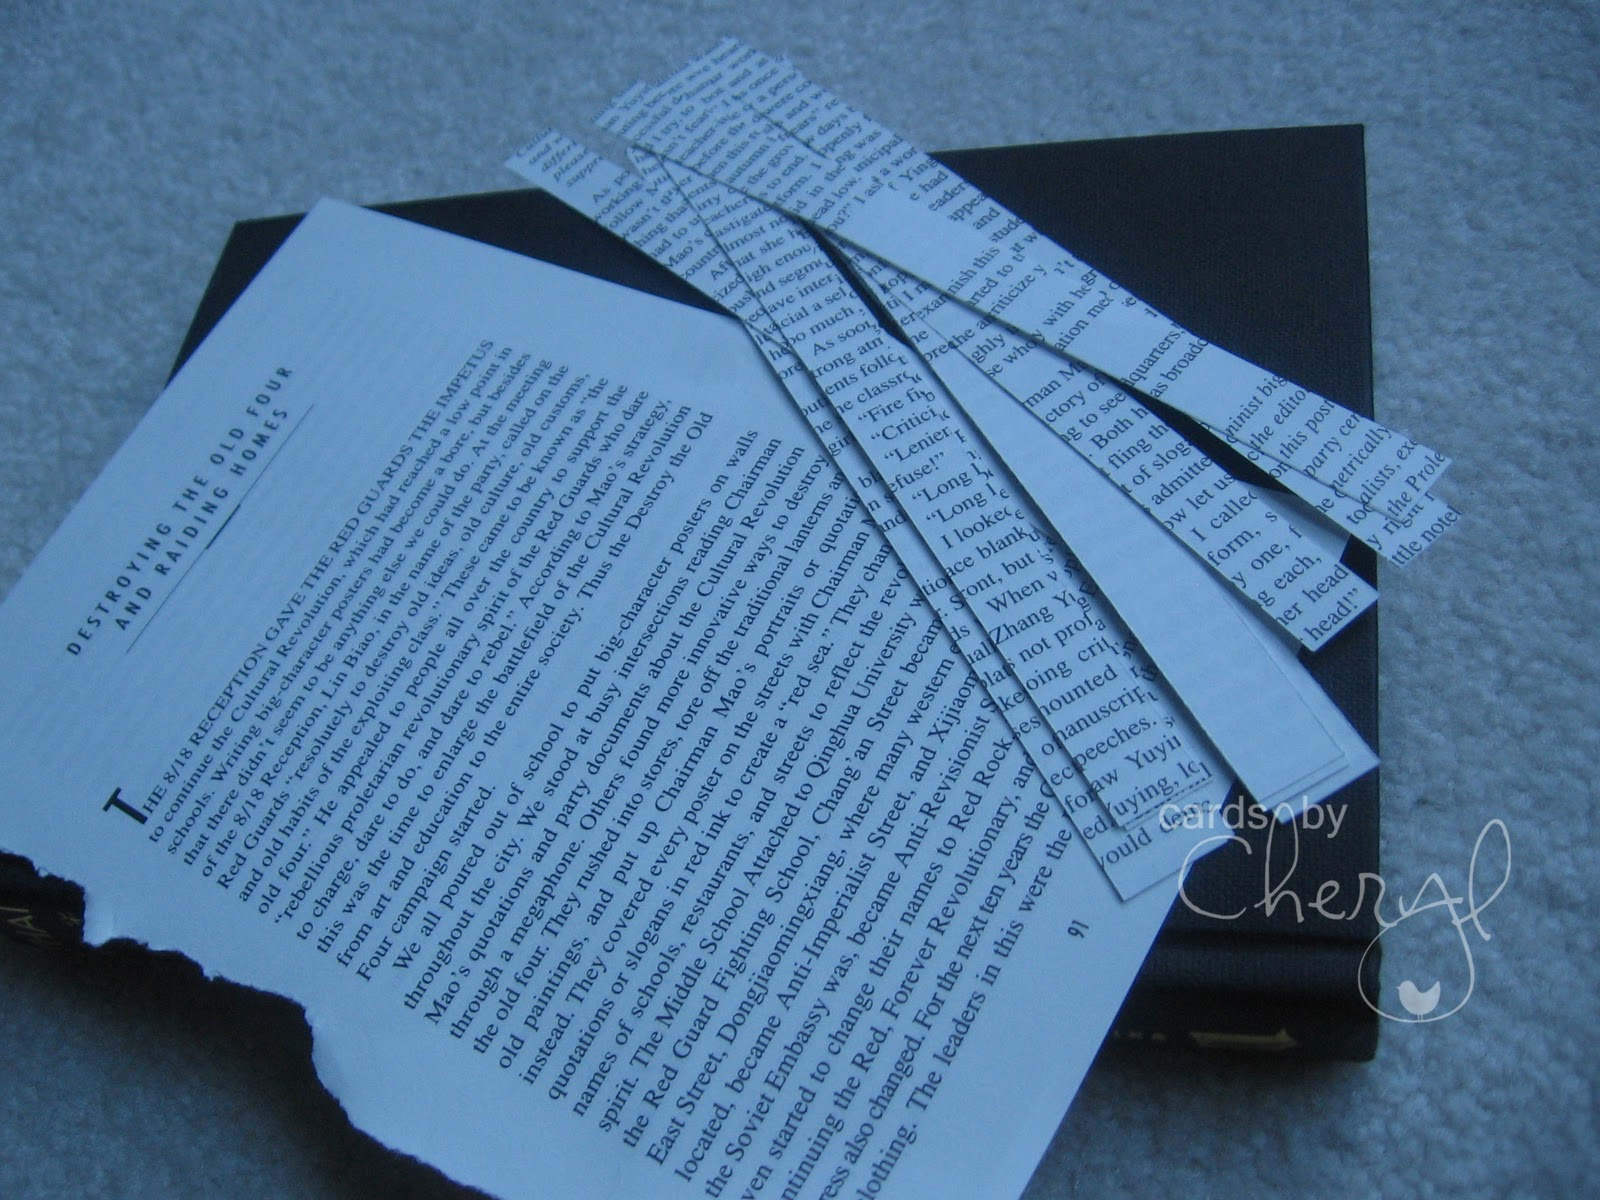 http://2.bp.blogspot.com/_TL_aHHMGUSE/TKfK1z7fV6I/AAAAAAAAA8Y/8ywUU69zpF4/s1600/Book+paper+02.jpg